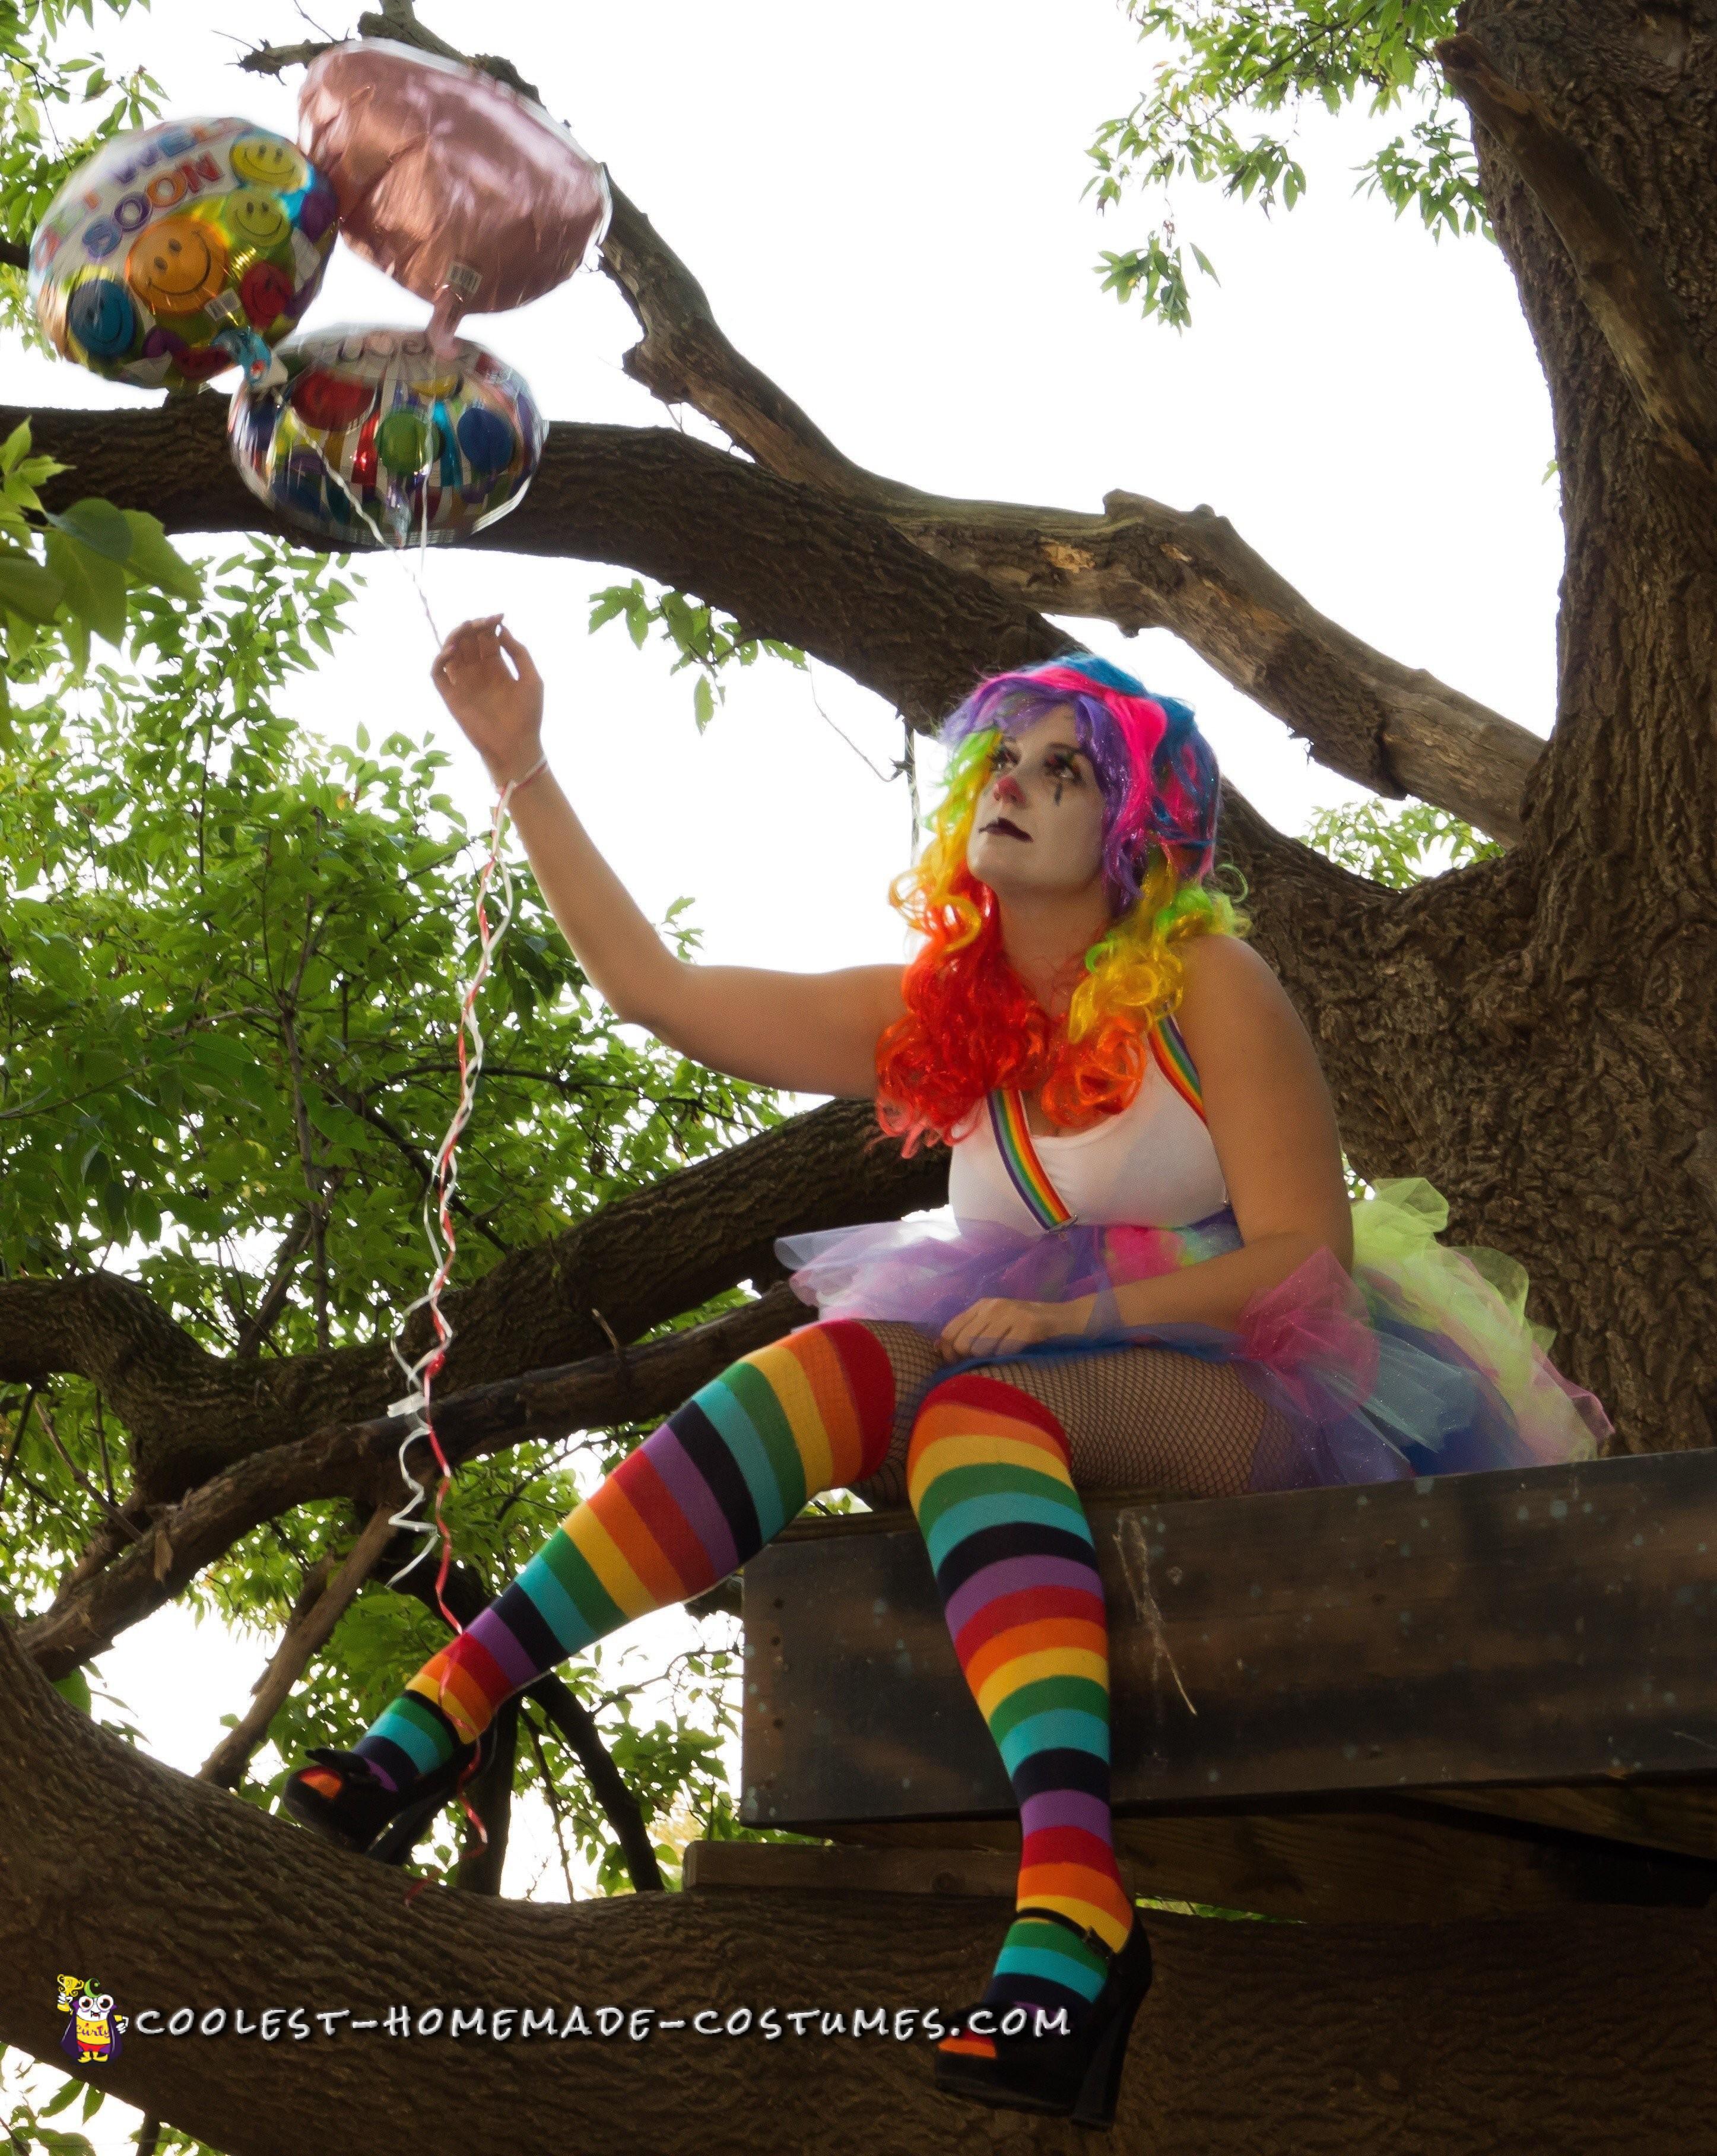 Woman's Clown Costume